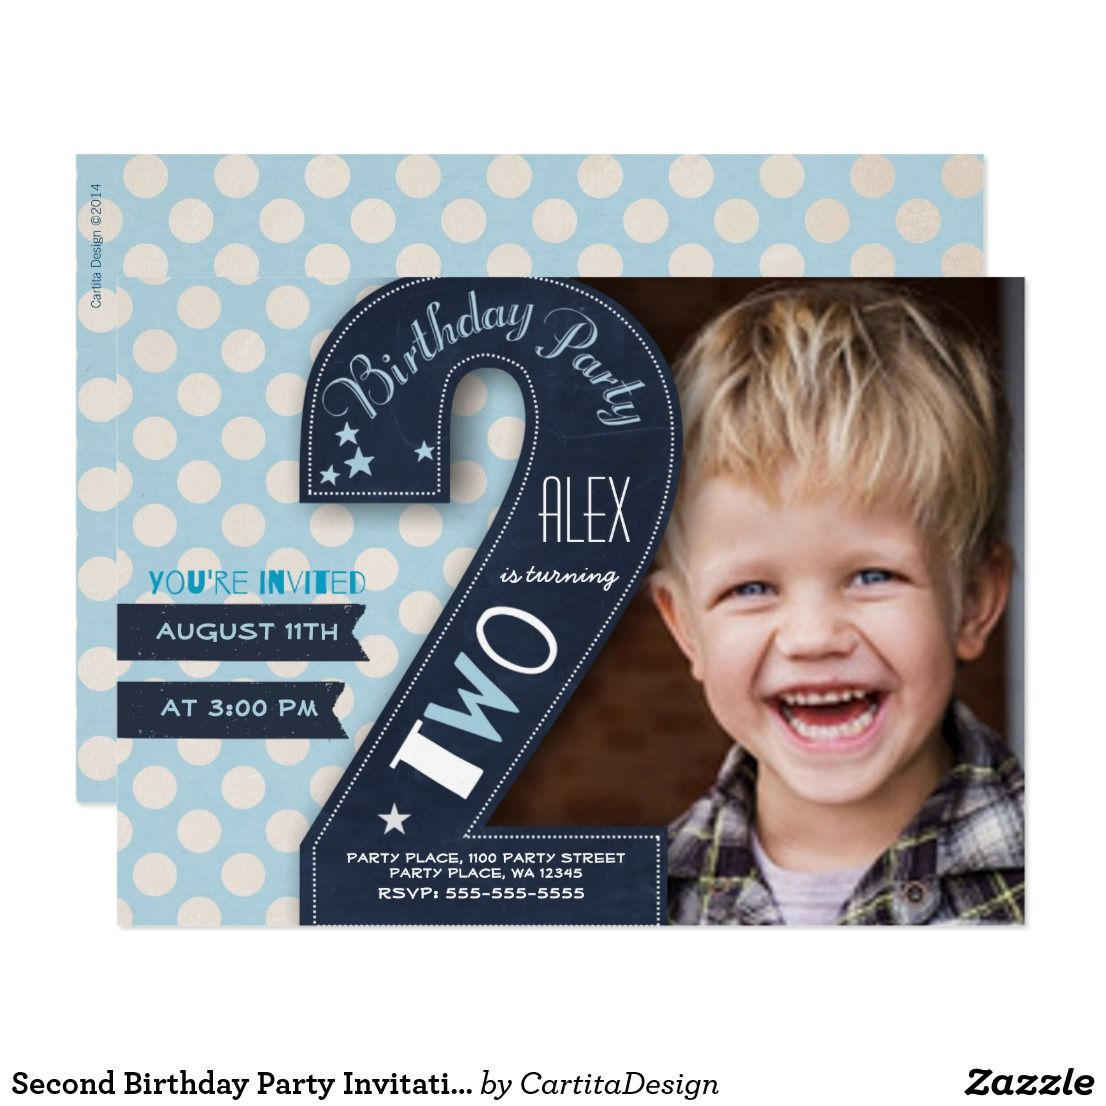 Second birthday party invitation boy chalkboard party invitations second birthday party invitation boy chalkboard filmwisefo Choice Image